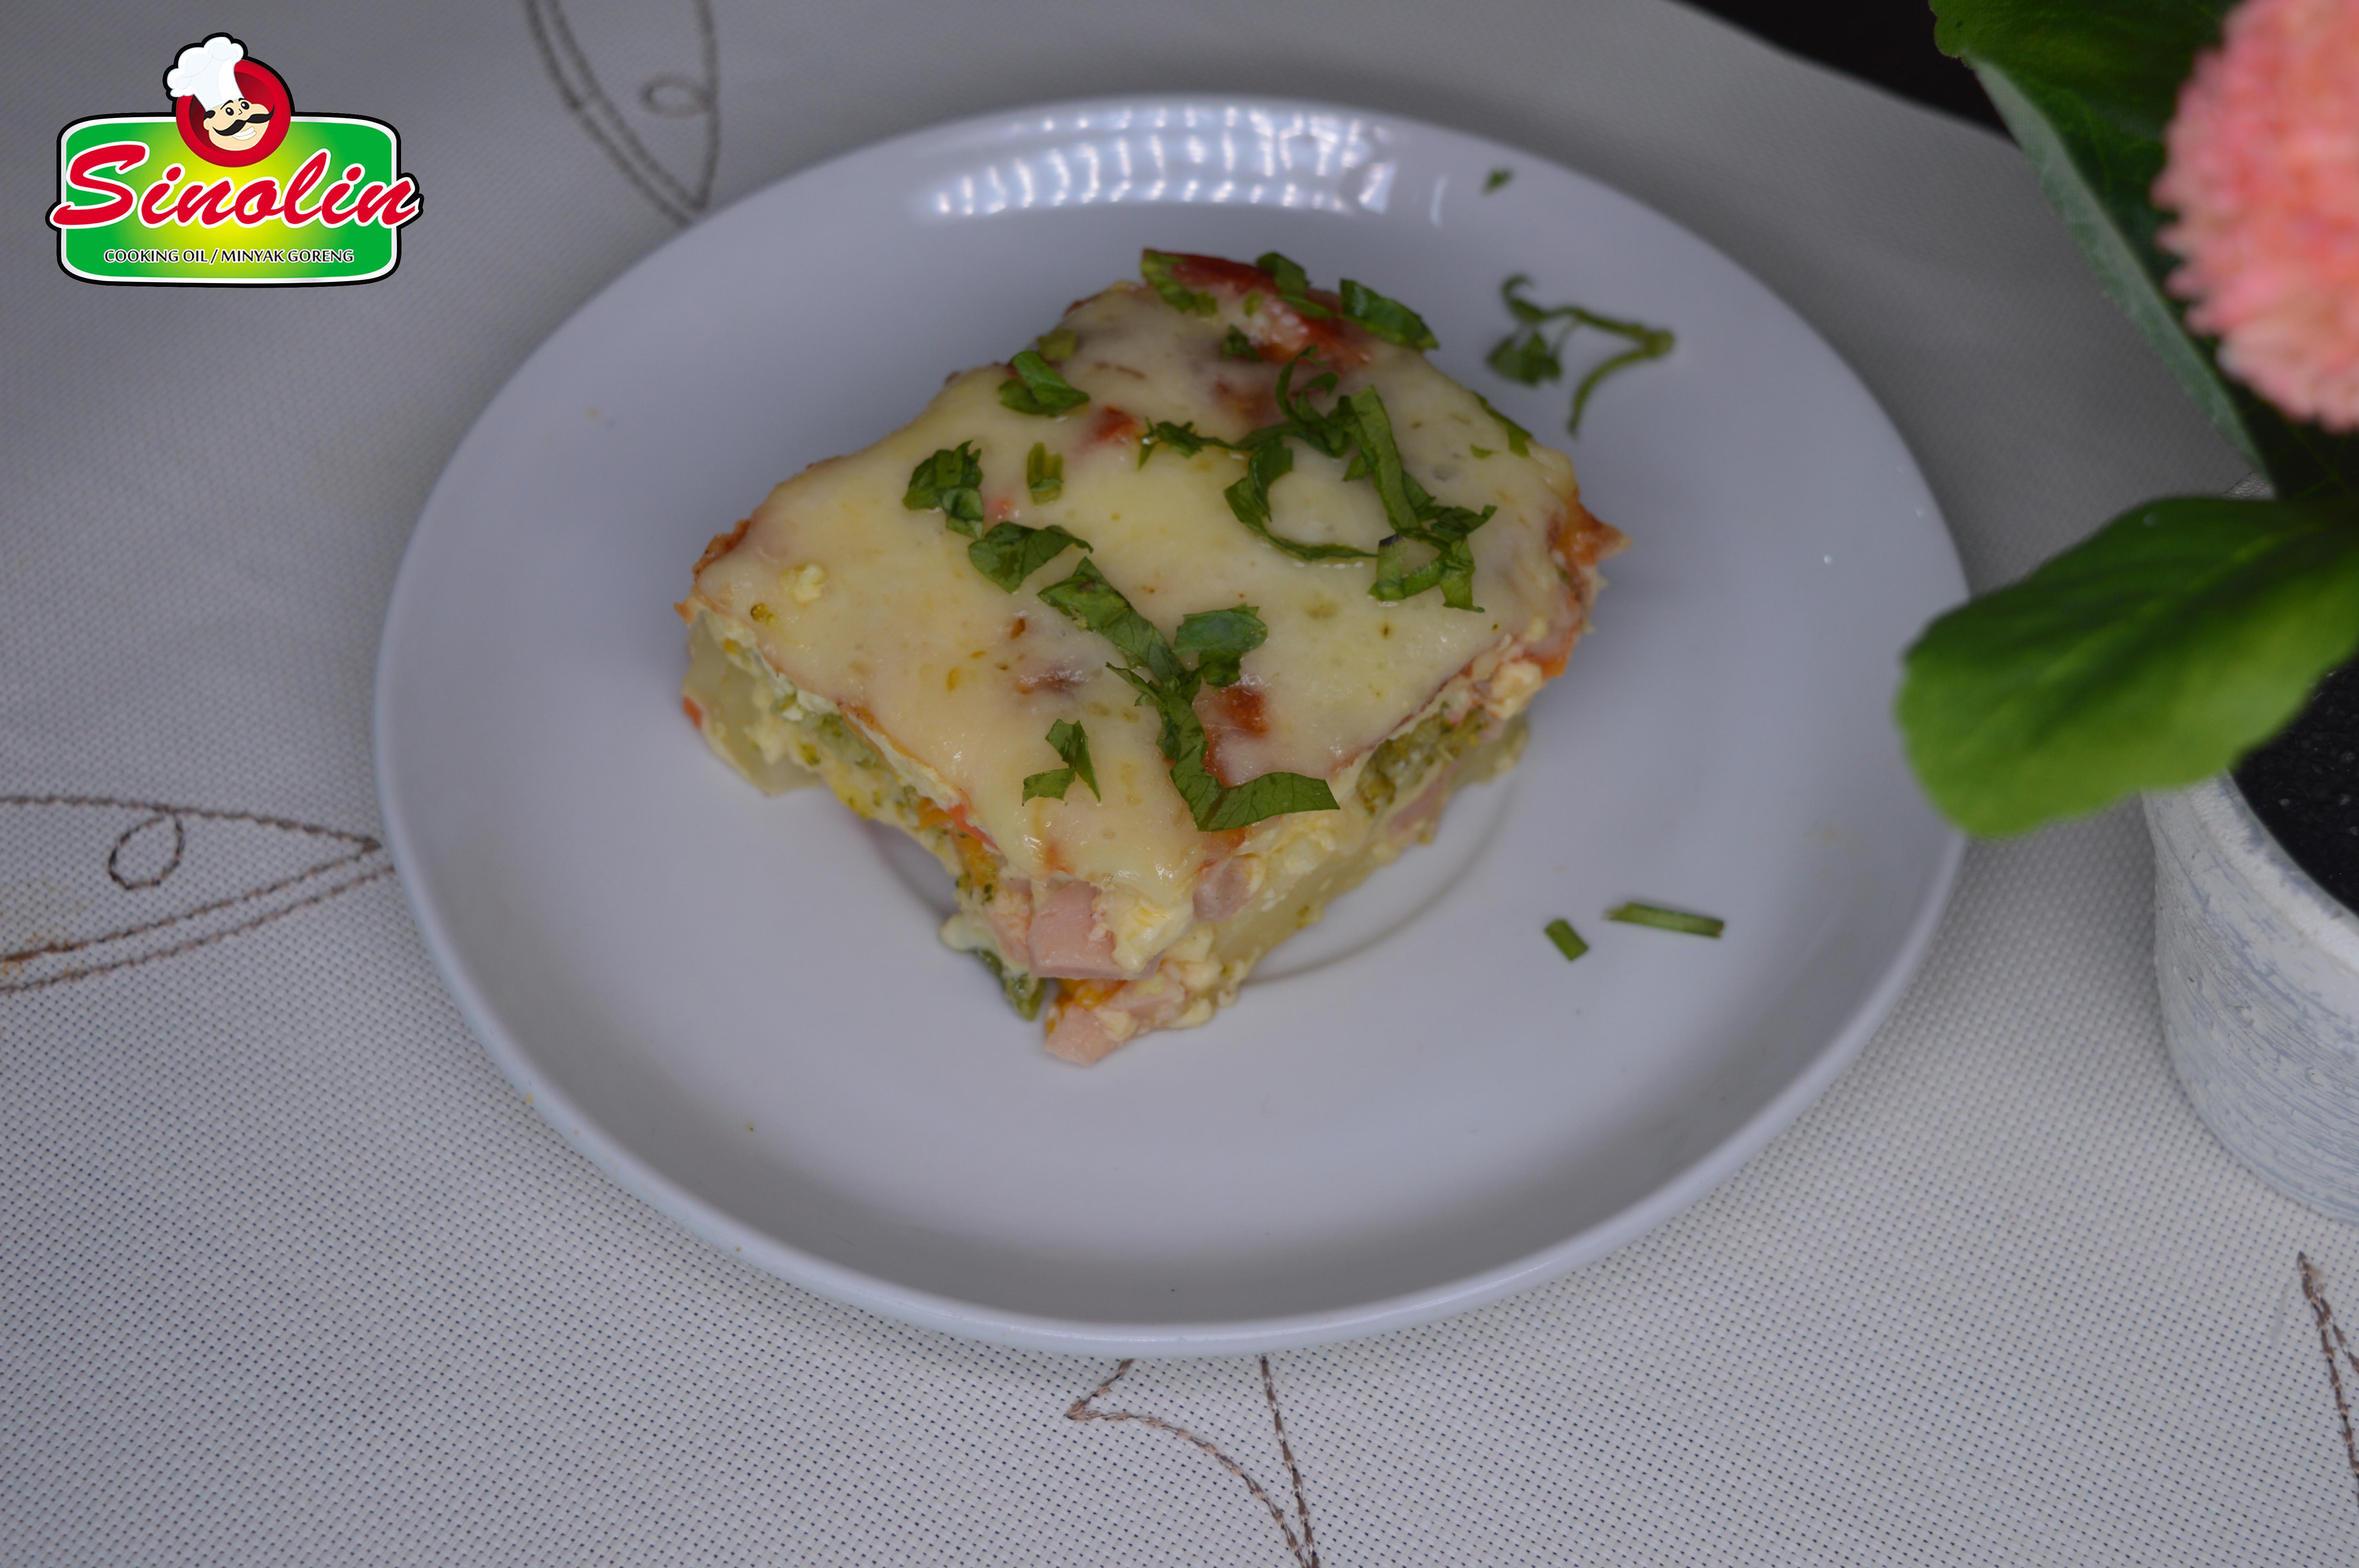 EASY SAUSAGE BREAKFAST CASSEROLE WITH VEGETABLES By Dapur Sinolin